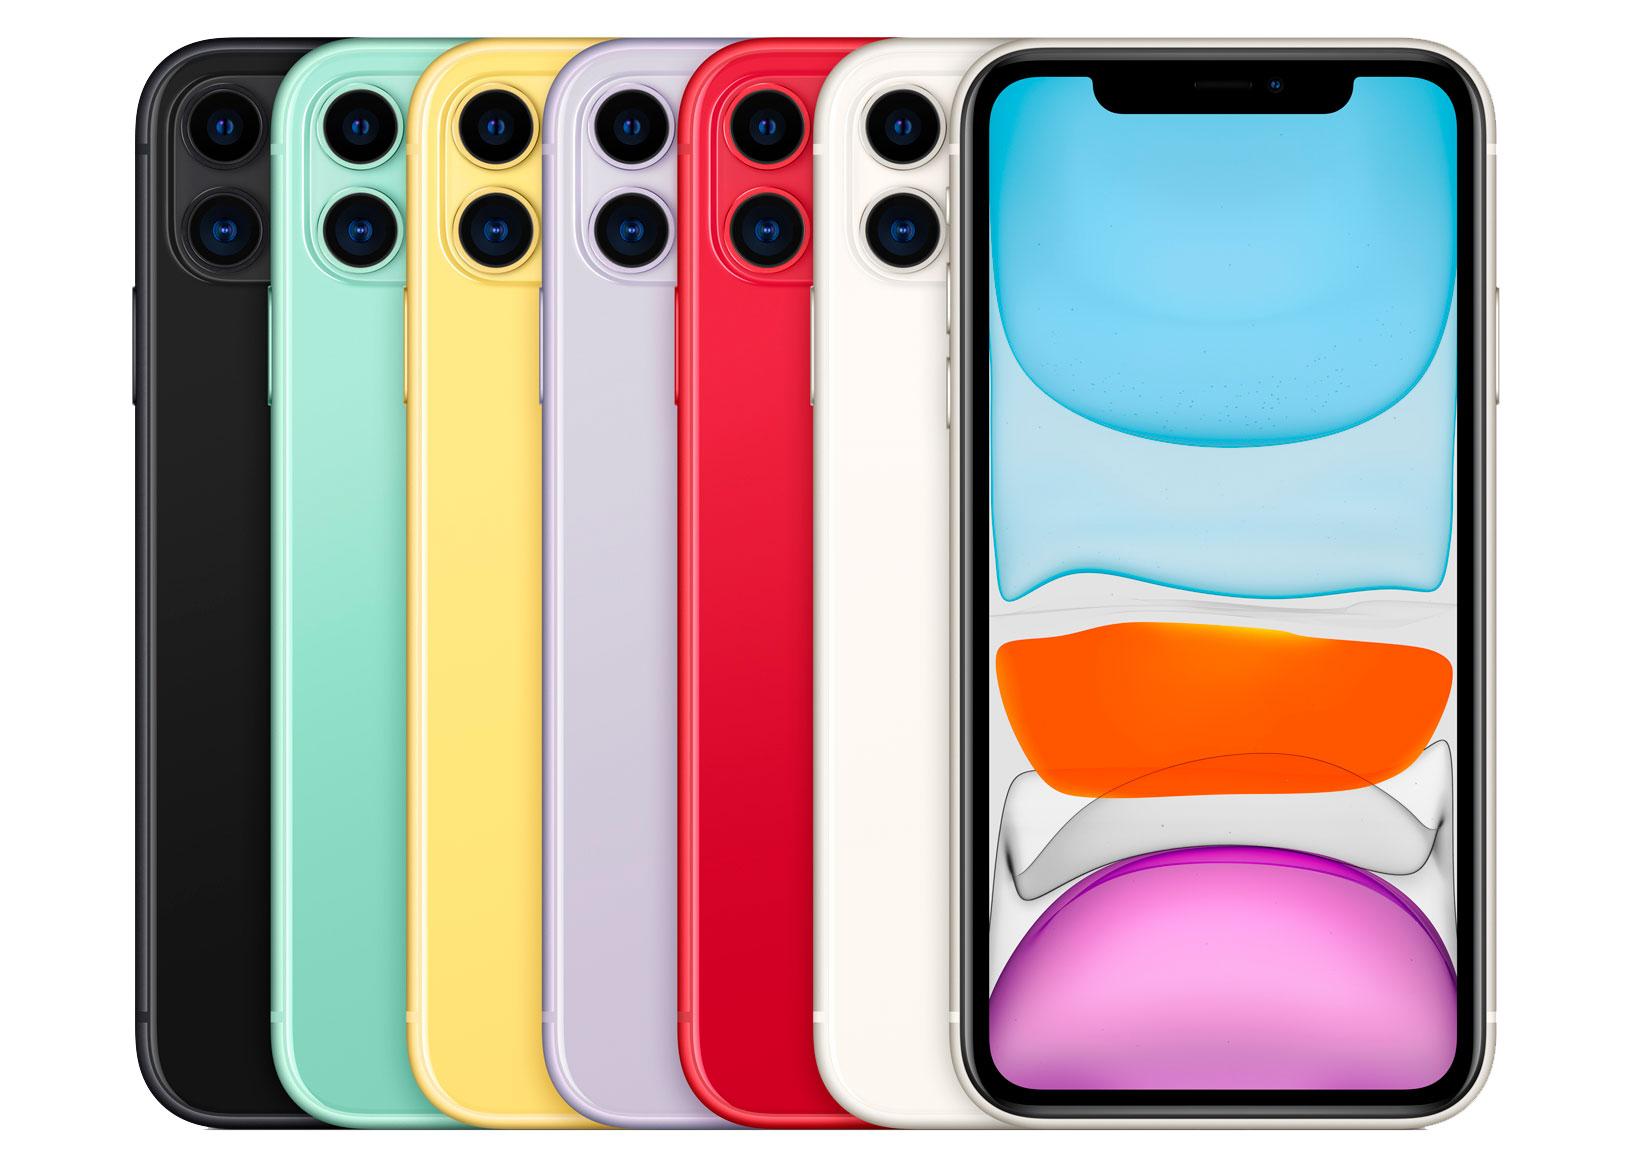 https://www.macfreak.nl/modules/news/images/zArt.Apple_iPhone11-family-lineup-091019.jpg